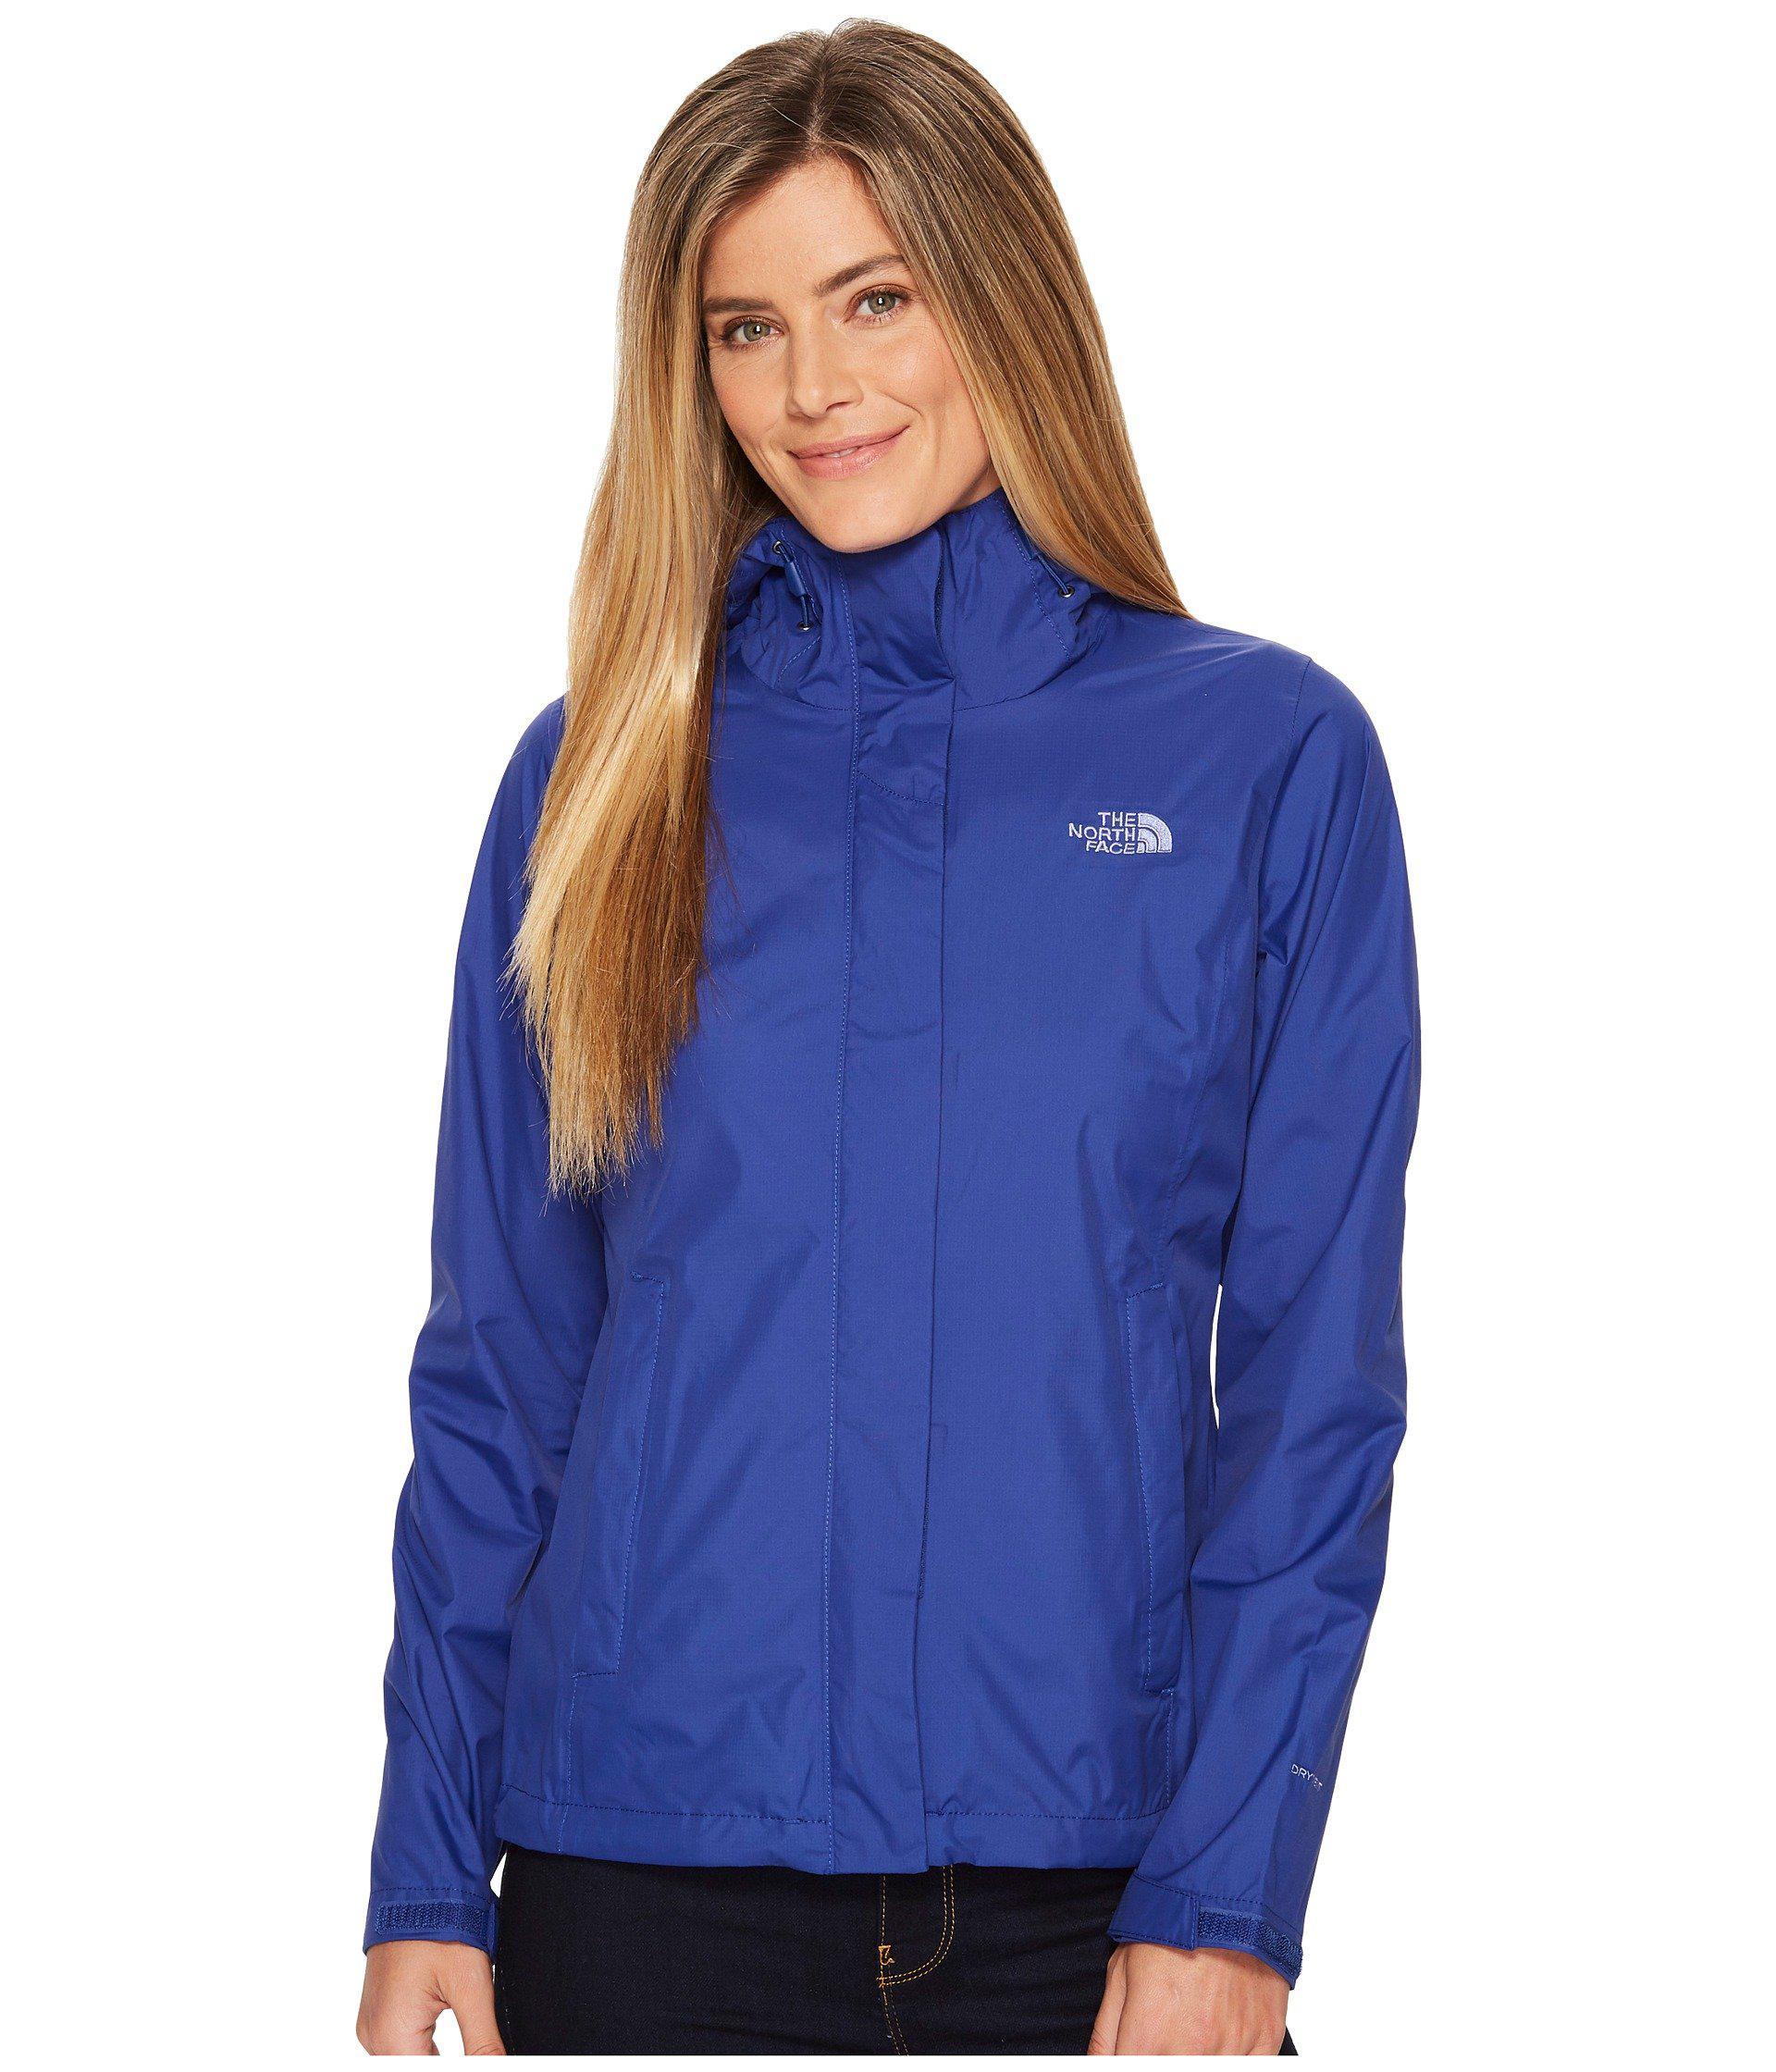 Lyst - The North Face Venture 2 Jacket (kokomo Green) Women s Coat ... 7c27f90d3